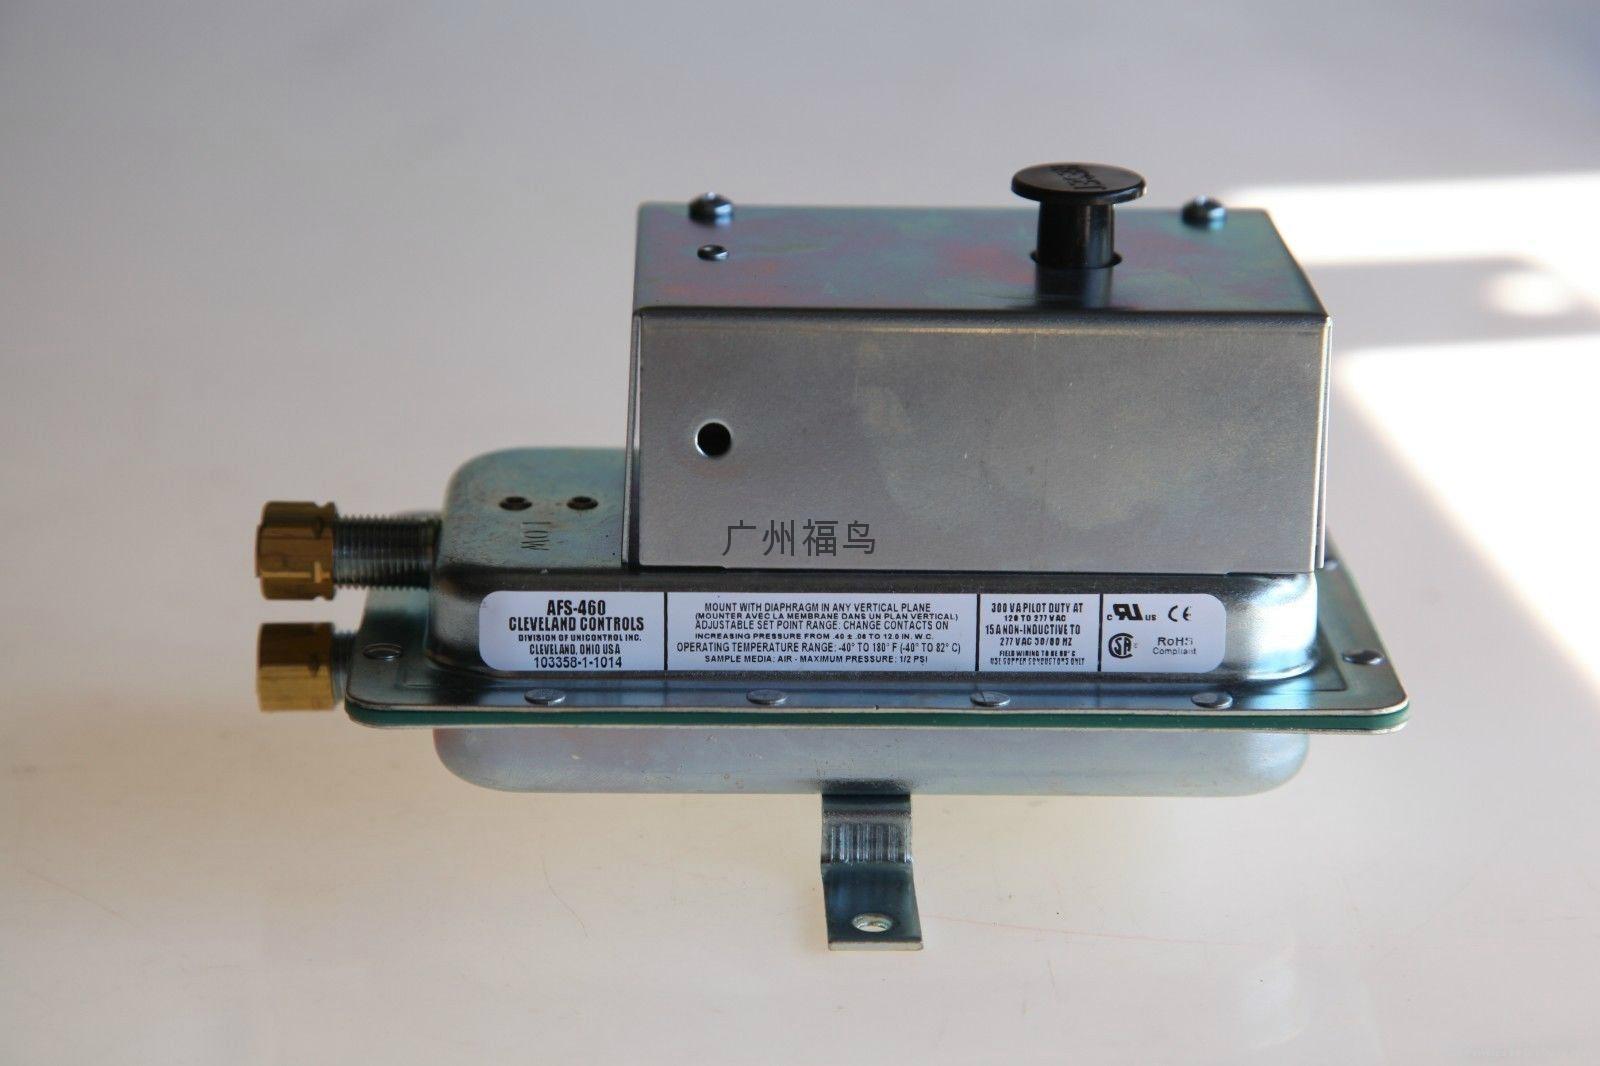 CLEVELAND CONTROLS壓力開關, 型號: AFS-460